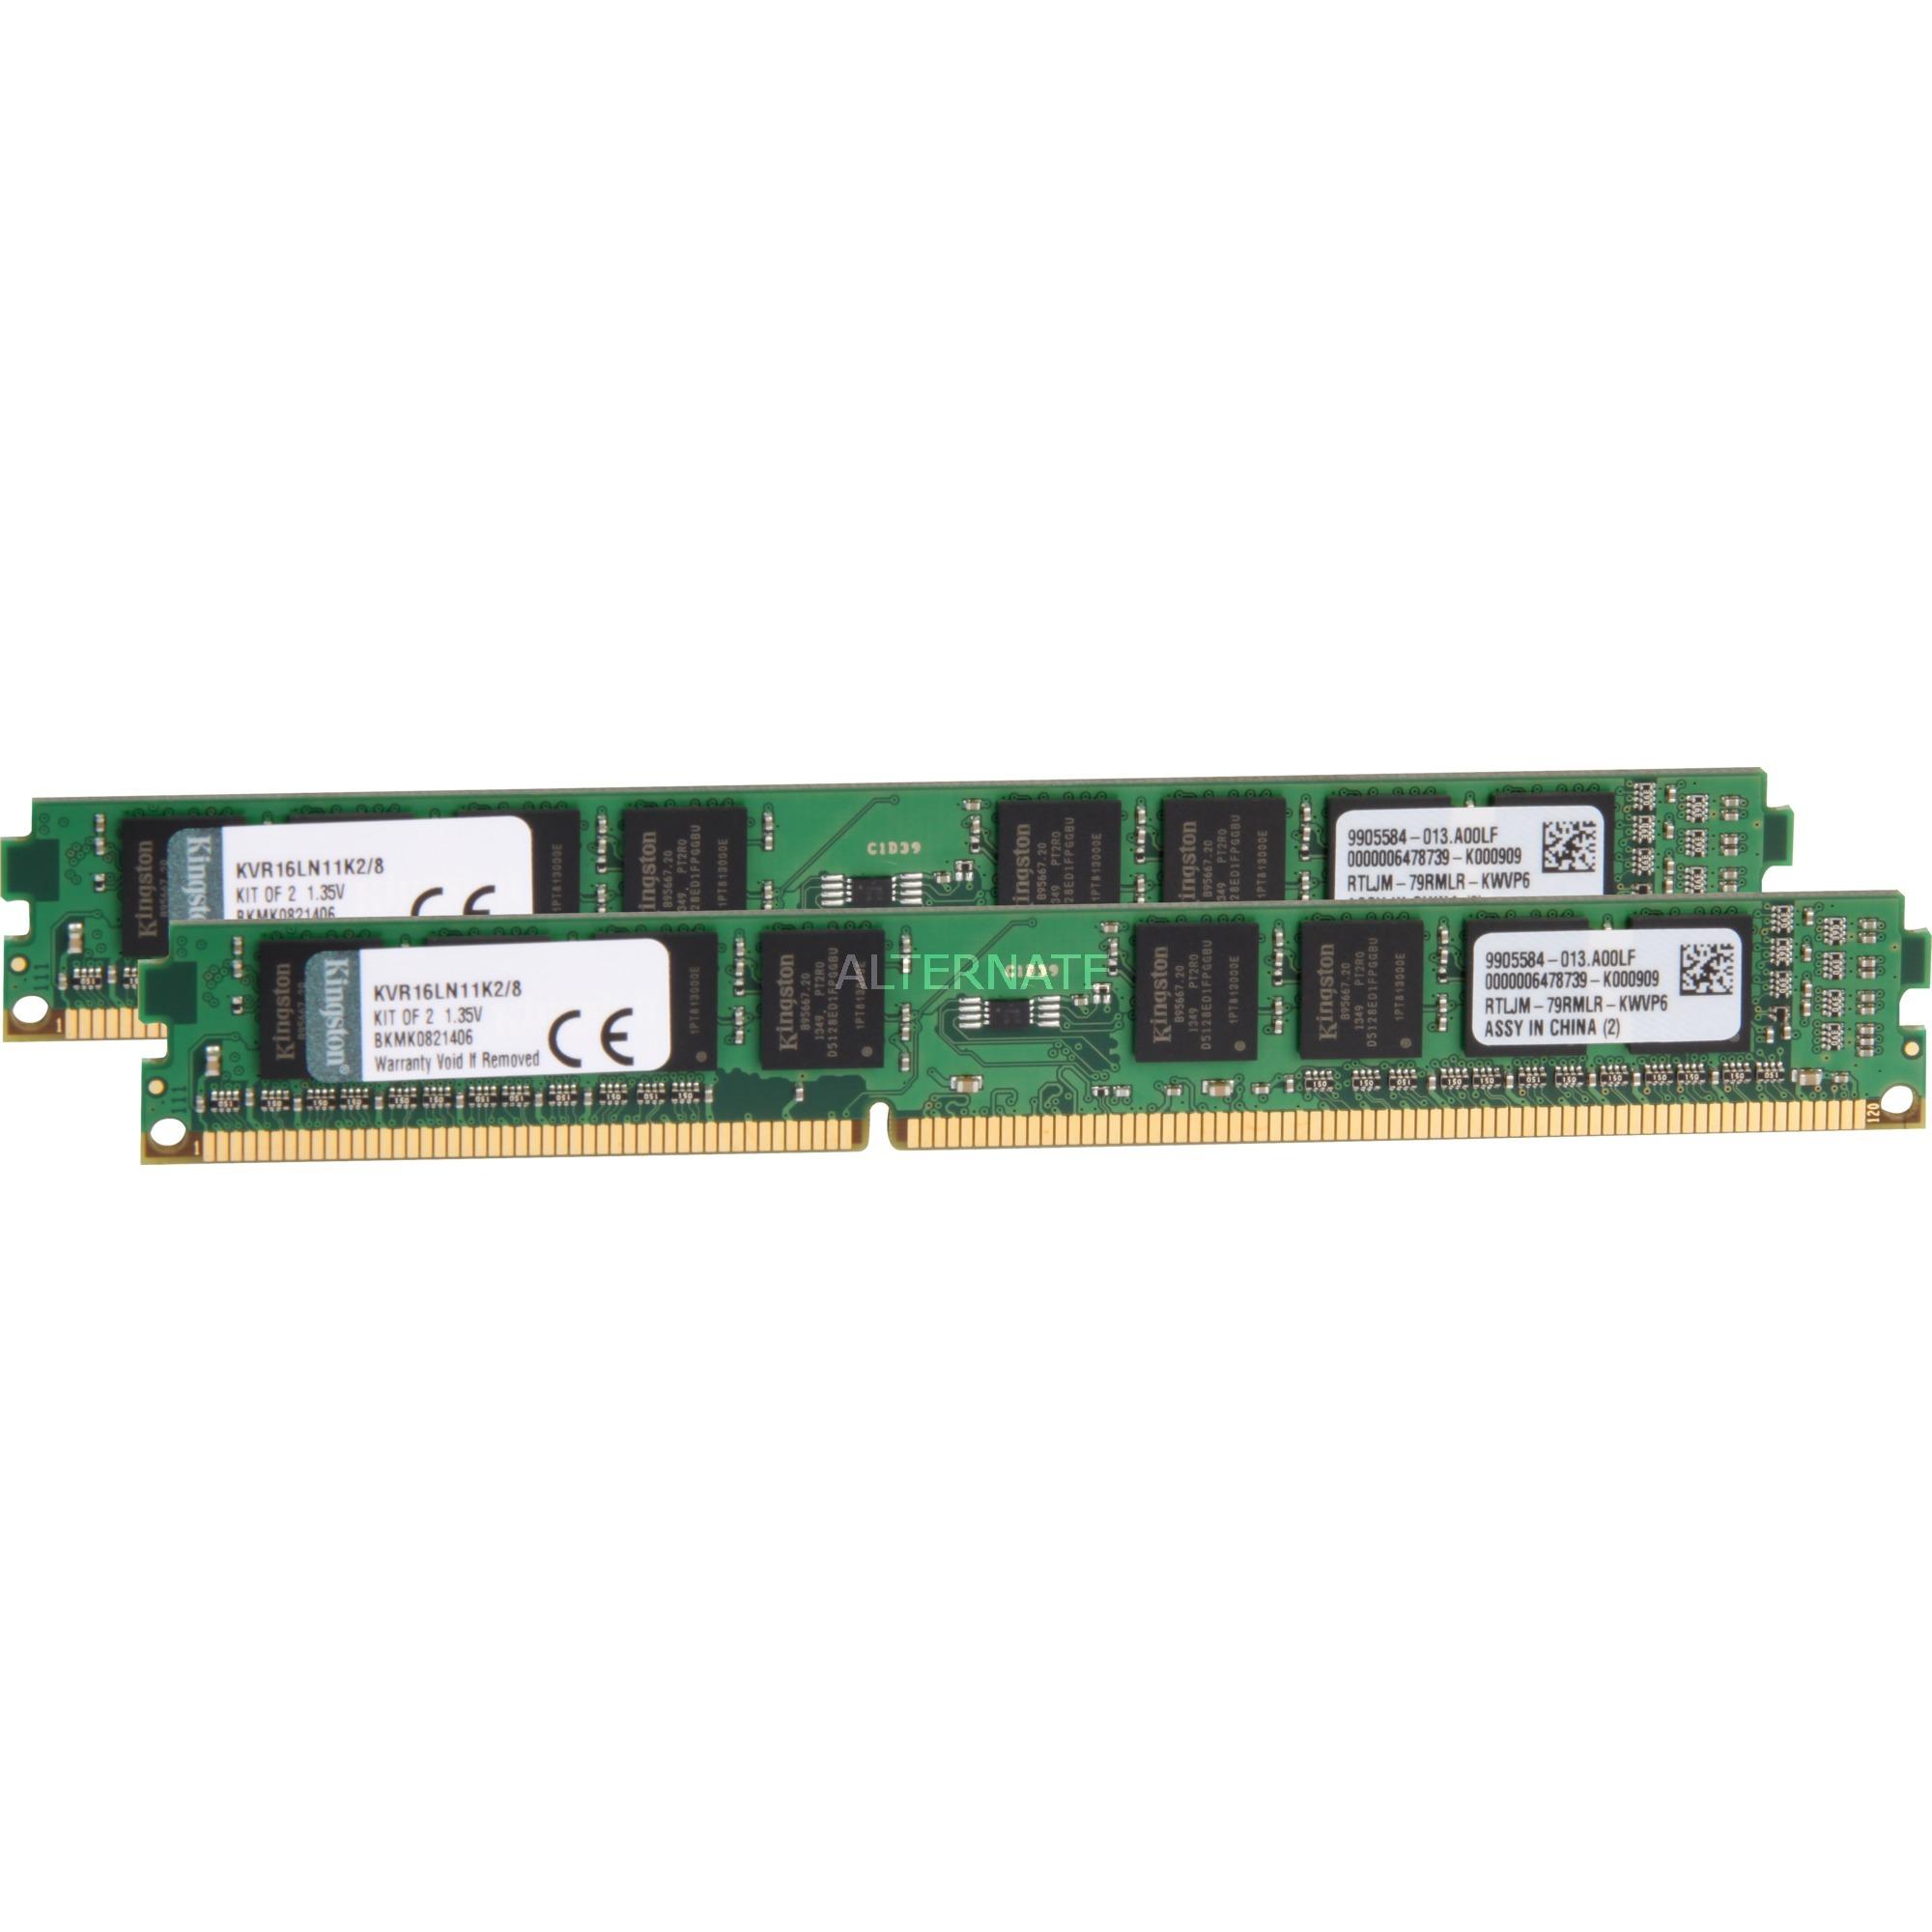 System Specific Memory 8GB DDR3-1600 8GB DDR3L 1600MHz módulo de memoria, Memoria RAM